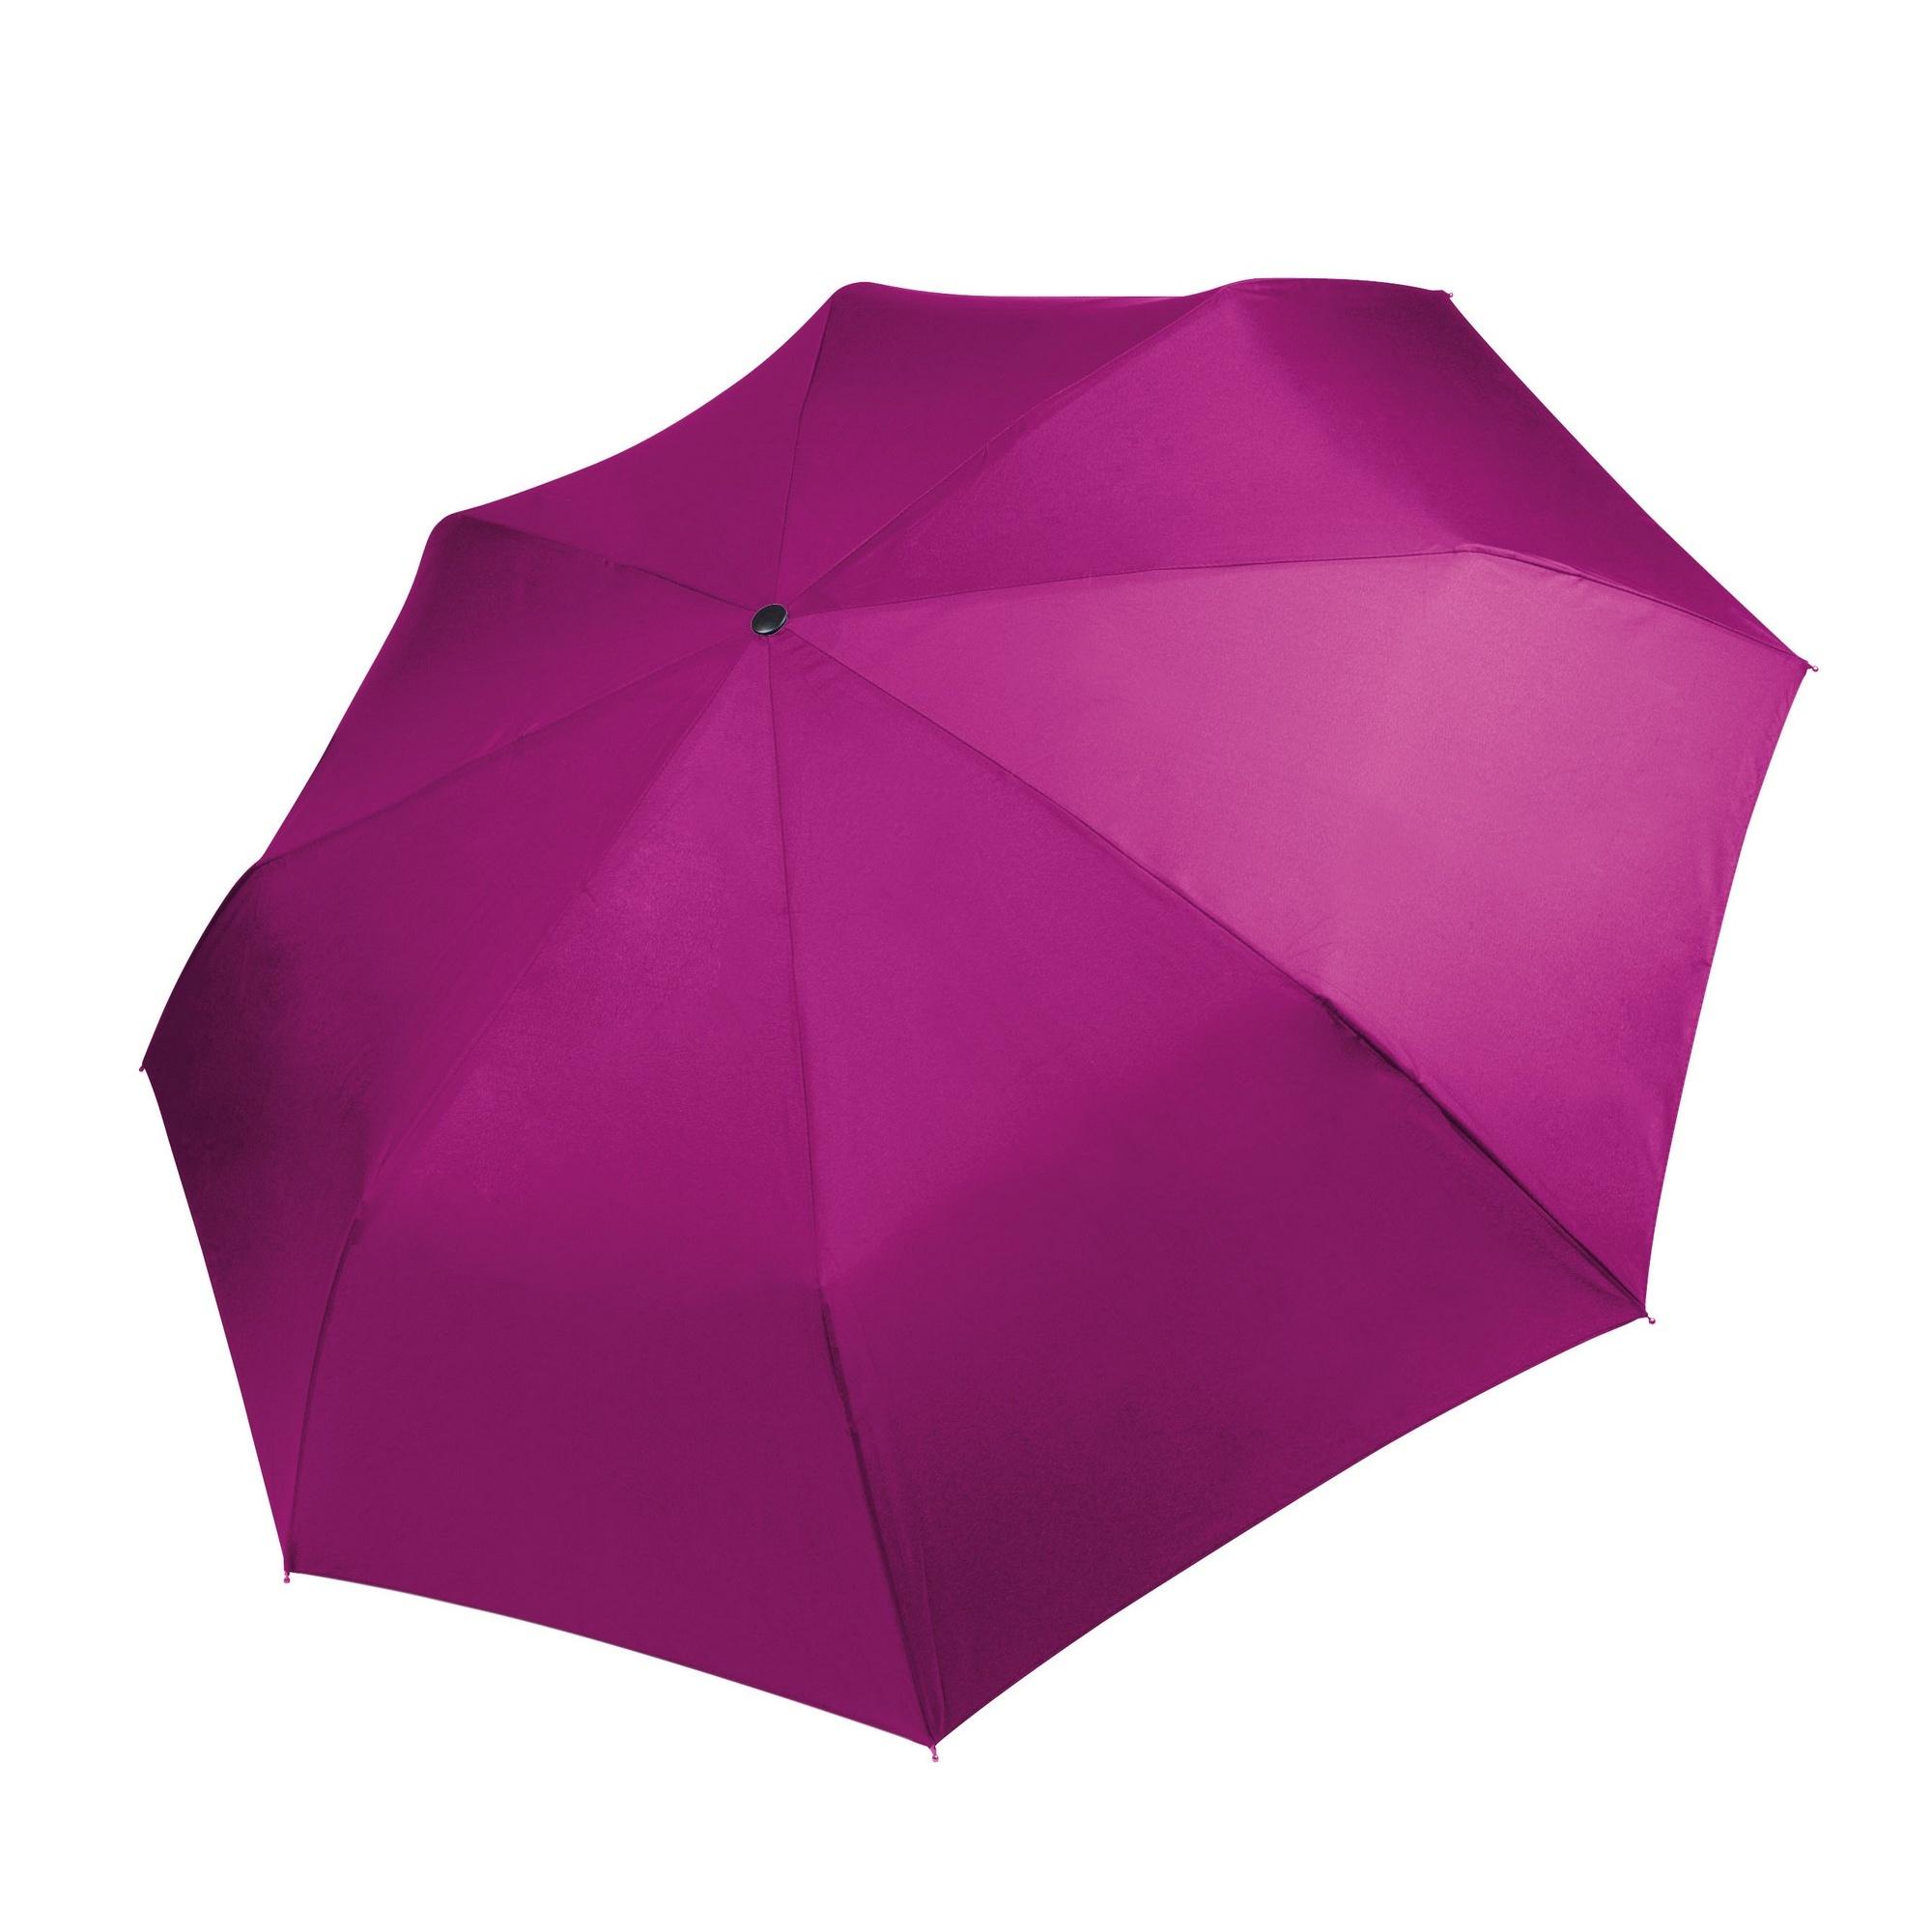 Kimood Foldable Handbag Umbrella (Pack of 2) (One Size) (Fuchsia)